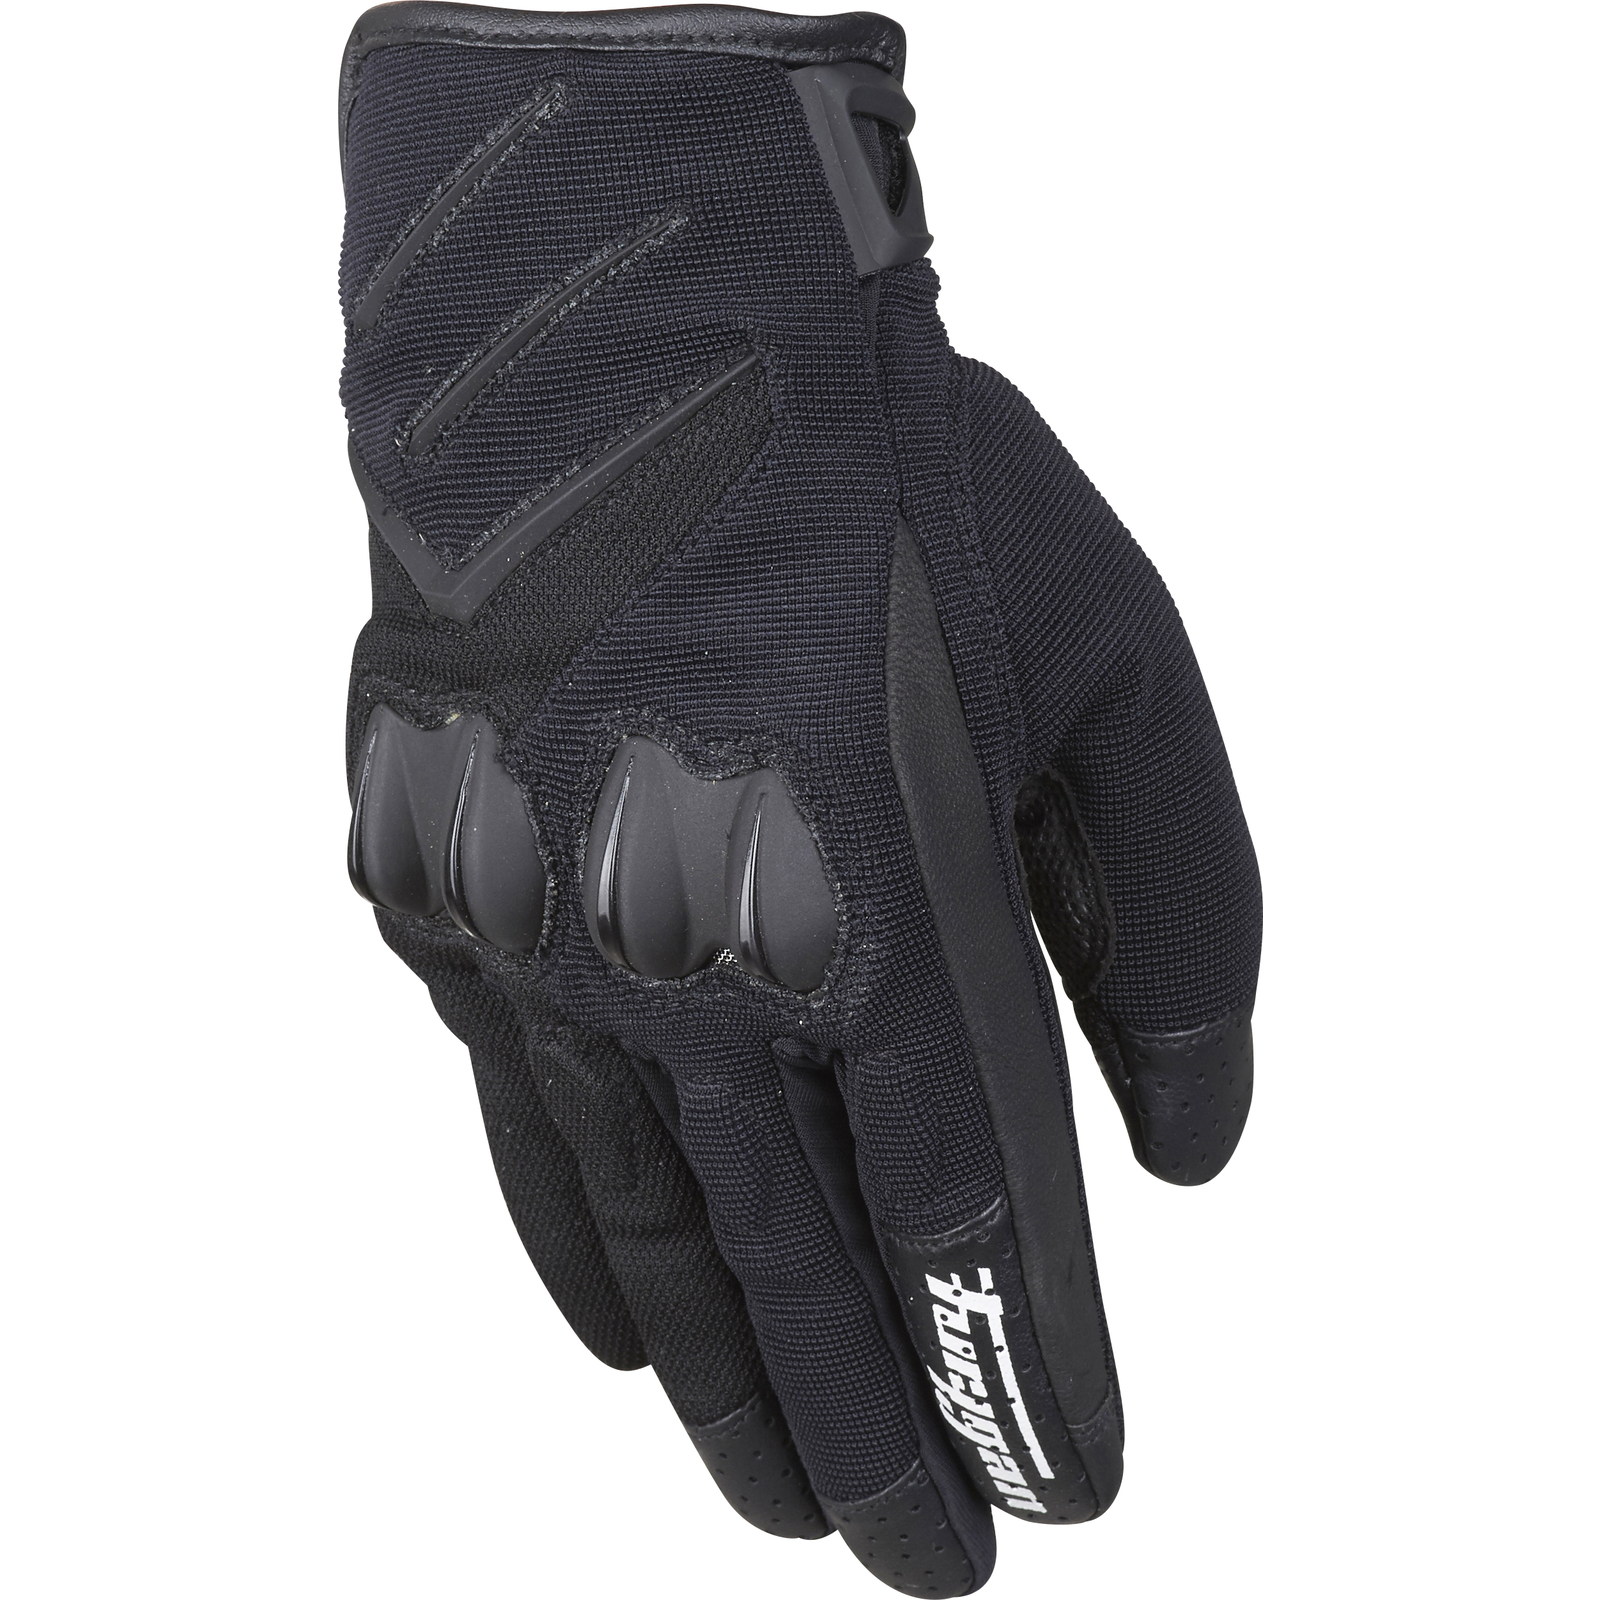 Motorcycle gloves for summer - Furygan Delta Motorcycle Gloves Textile Mens Summer Vented